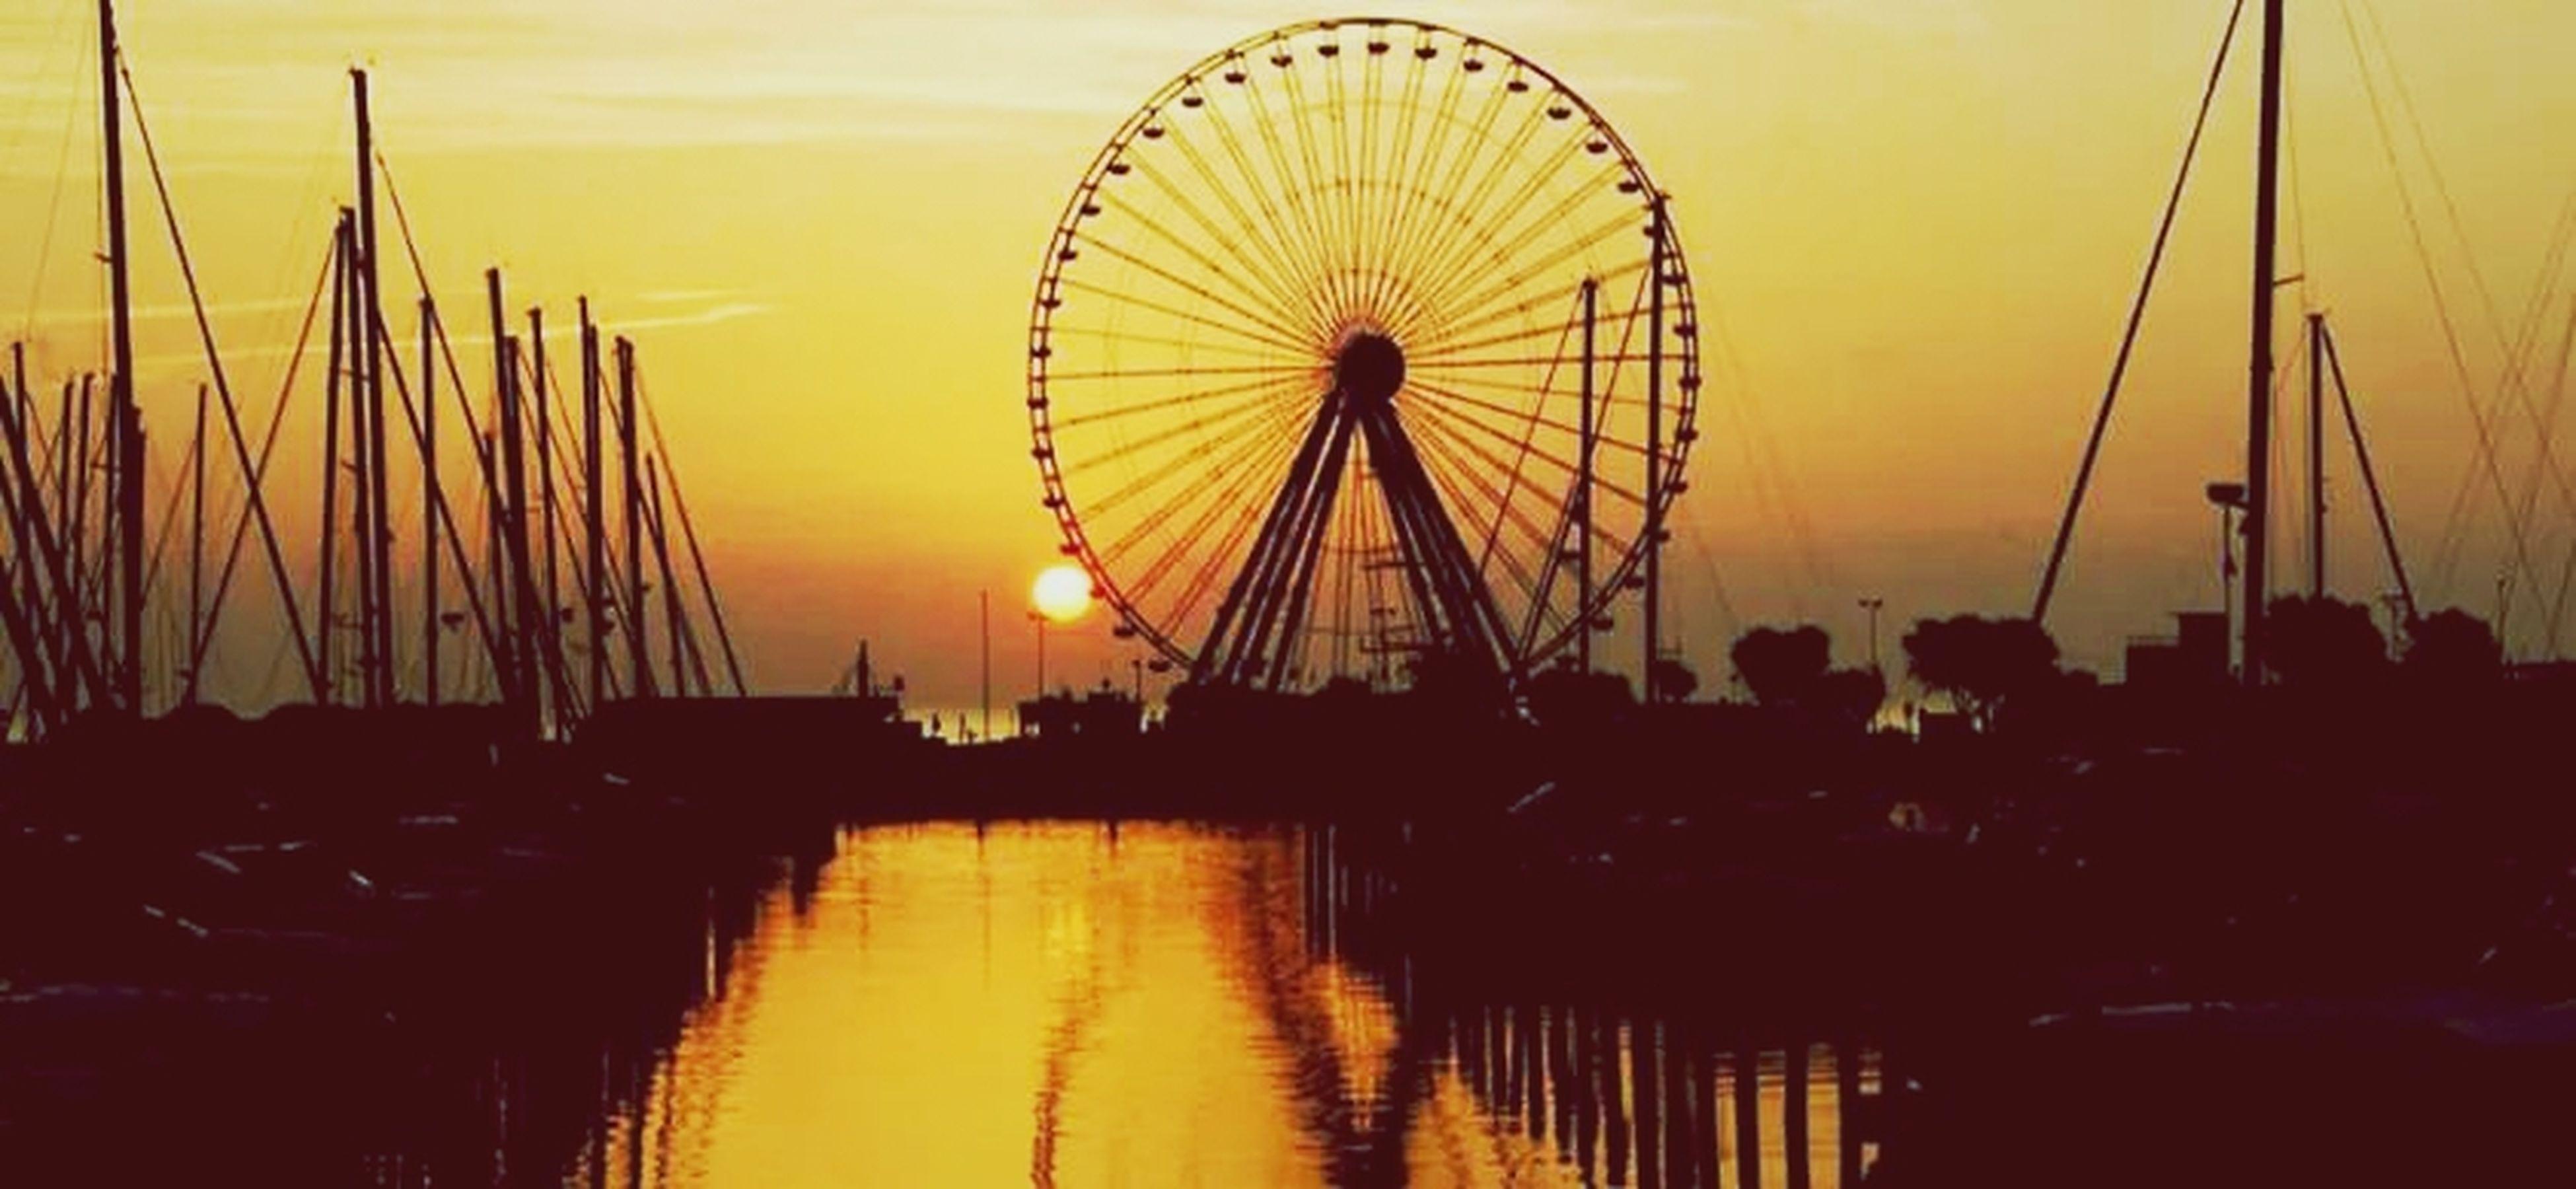 sunset, ferris wheel, amusement park, amusement park ride, arts culture and entertainment, silhouette, sky, orange color, water, nautical vessel, transportation, sea, mode of transport, boat, outdoors, nature, dusk, cloud - sky, mast, leisure activity